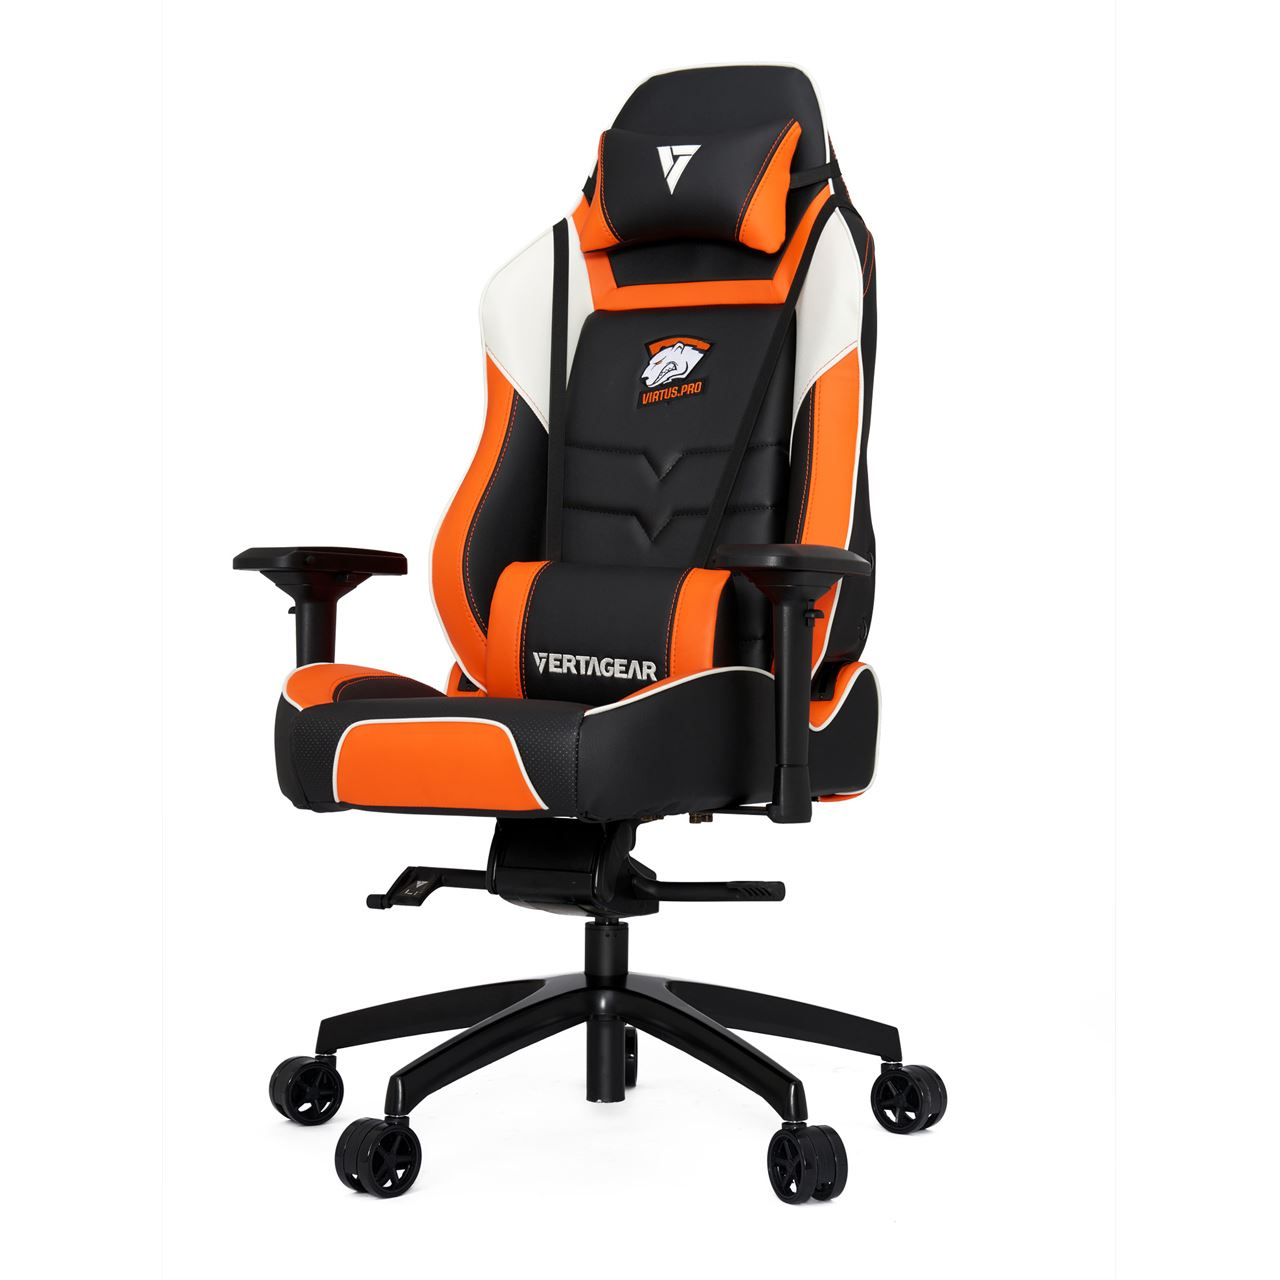 Vertagear Racing Series Pl6000 Gaming Chair Virtus Pro